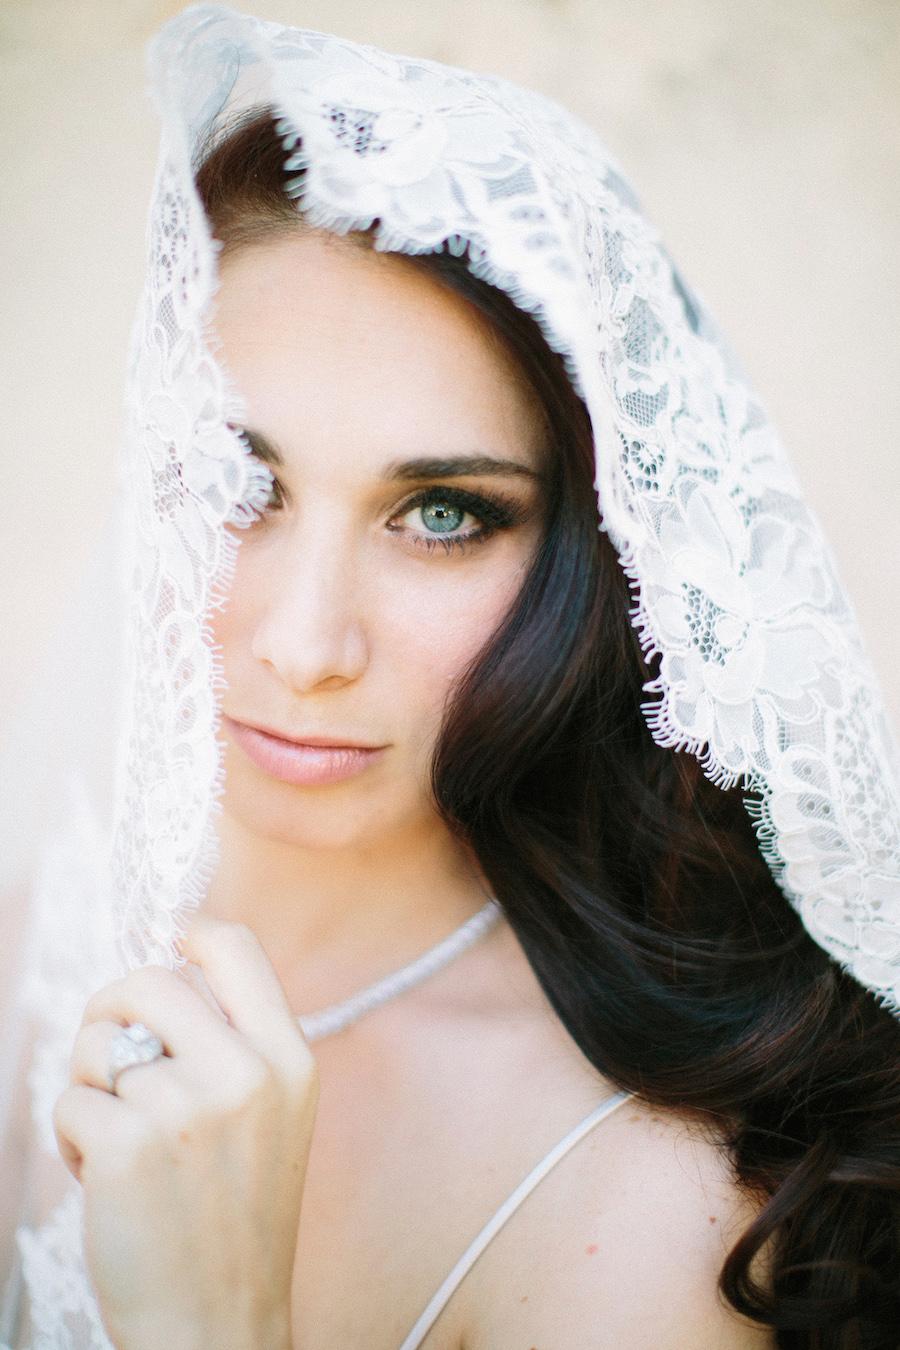 saya-photography-jewish-wedding-provence-rustic-lourmarin-le-galinier-38.jpg